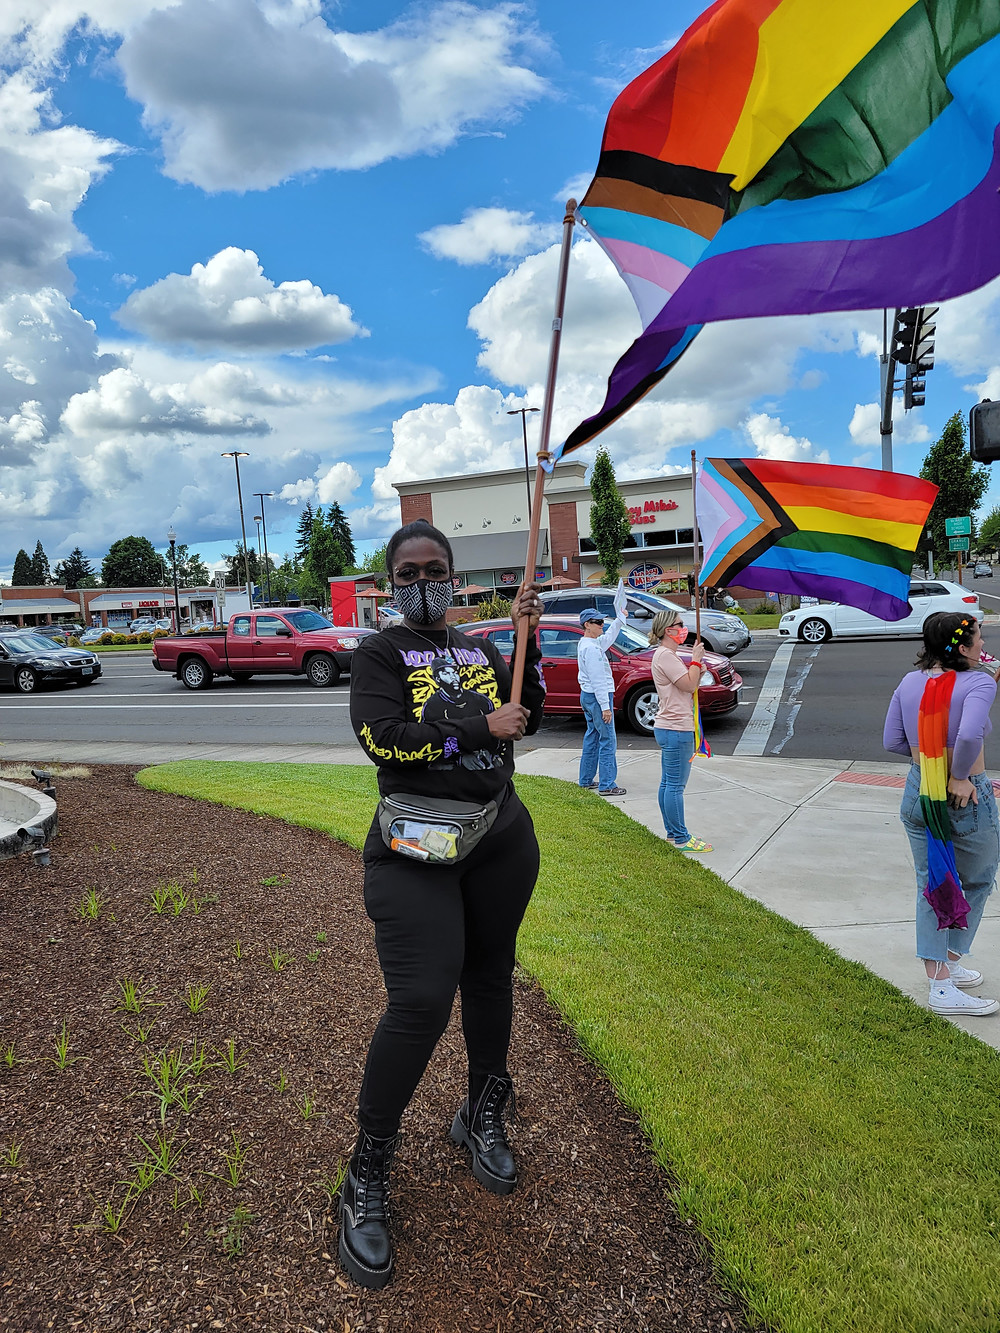 Amira holding a Pride flag